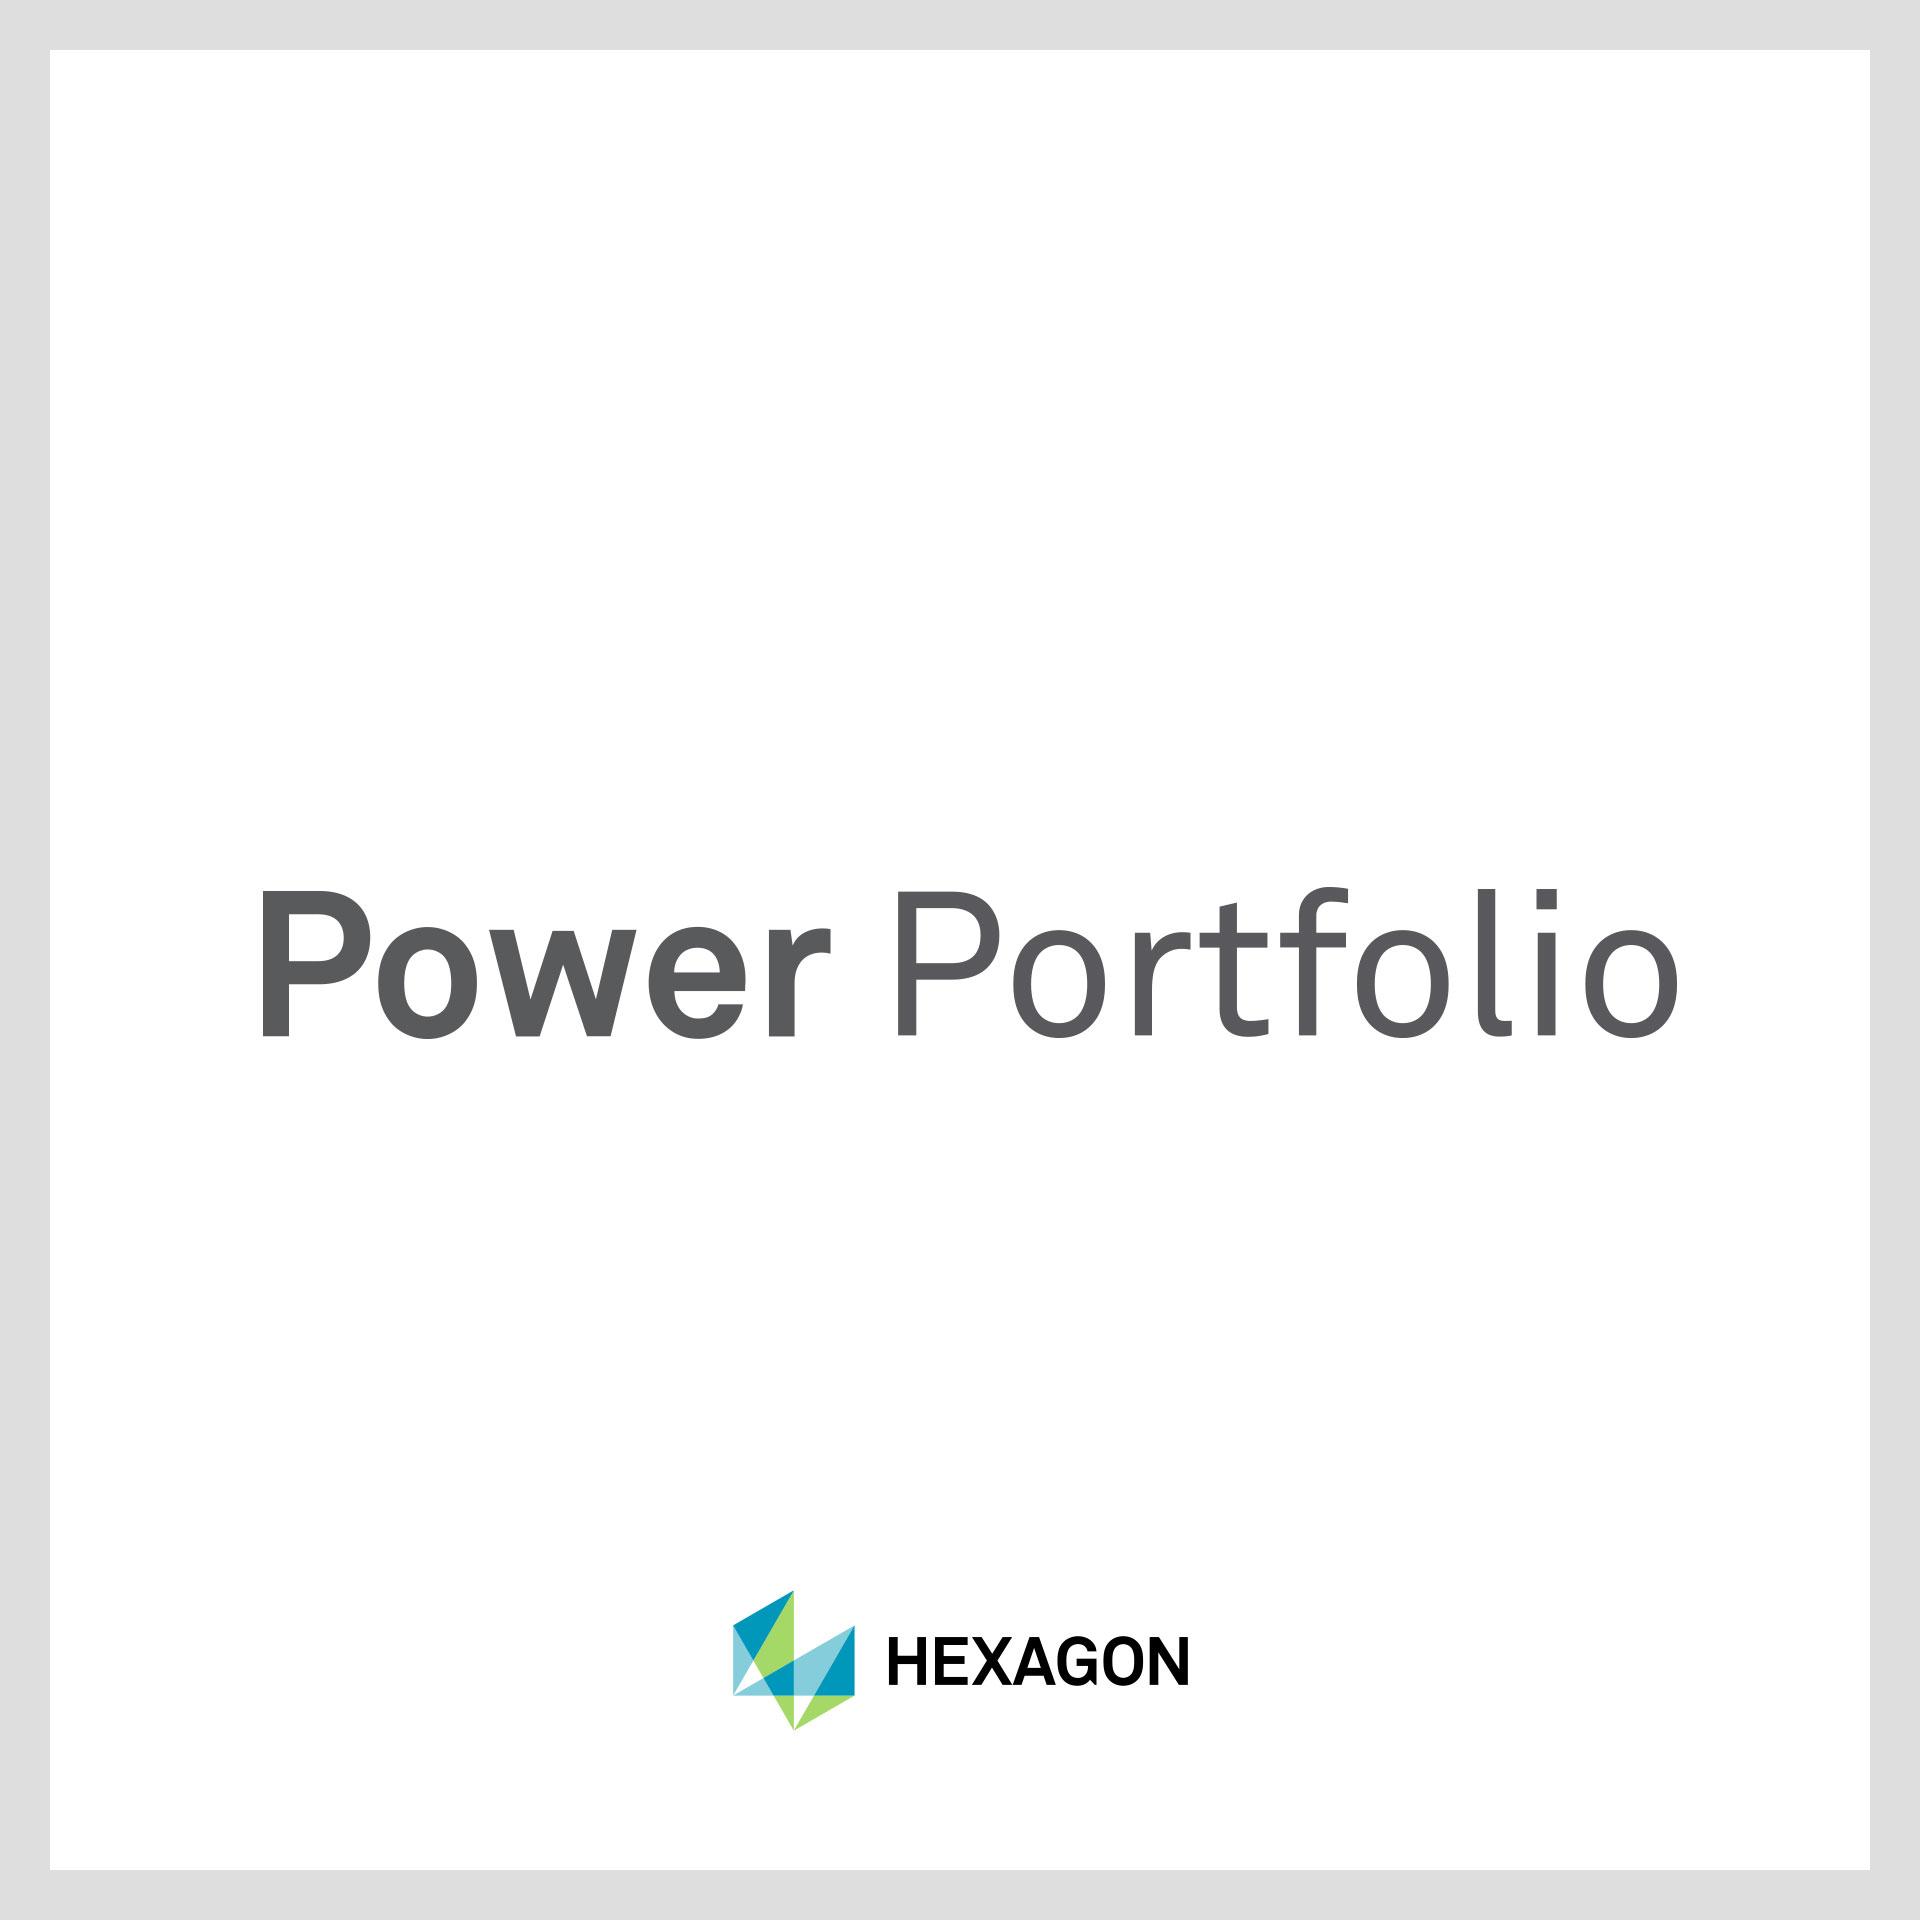 Power Portfolio Technologies